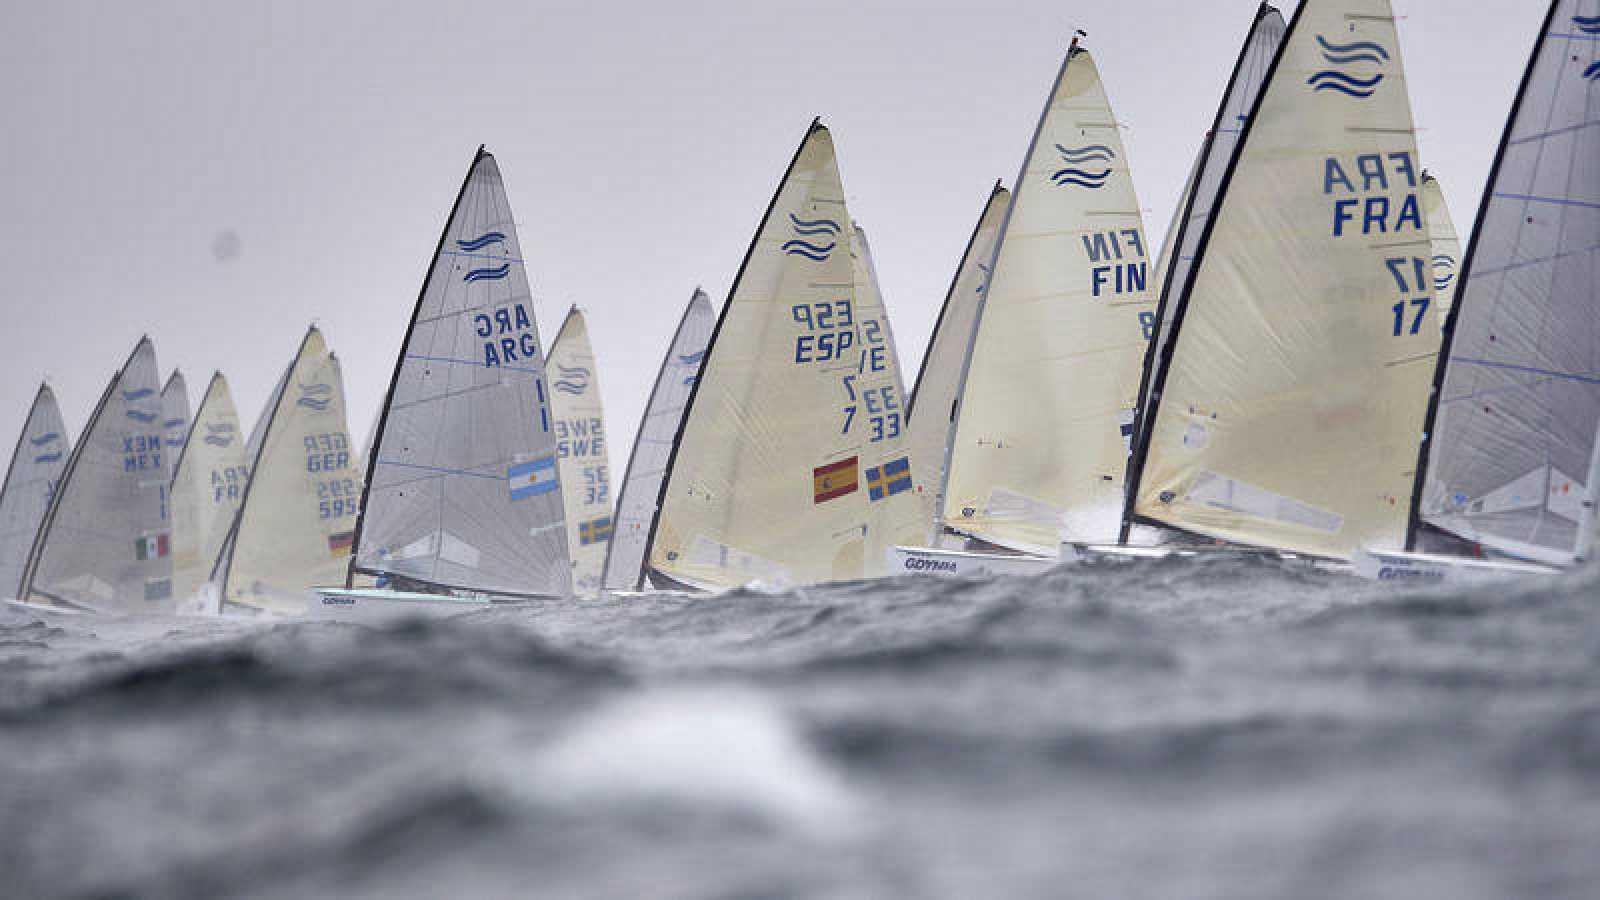 Imagen del Campeonato de Europa de vela en clase Finn.